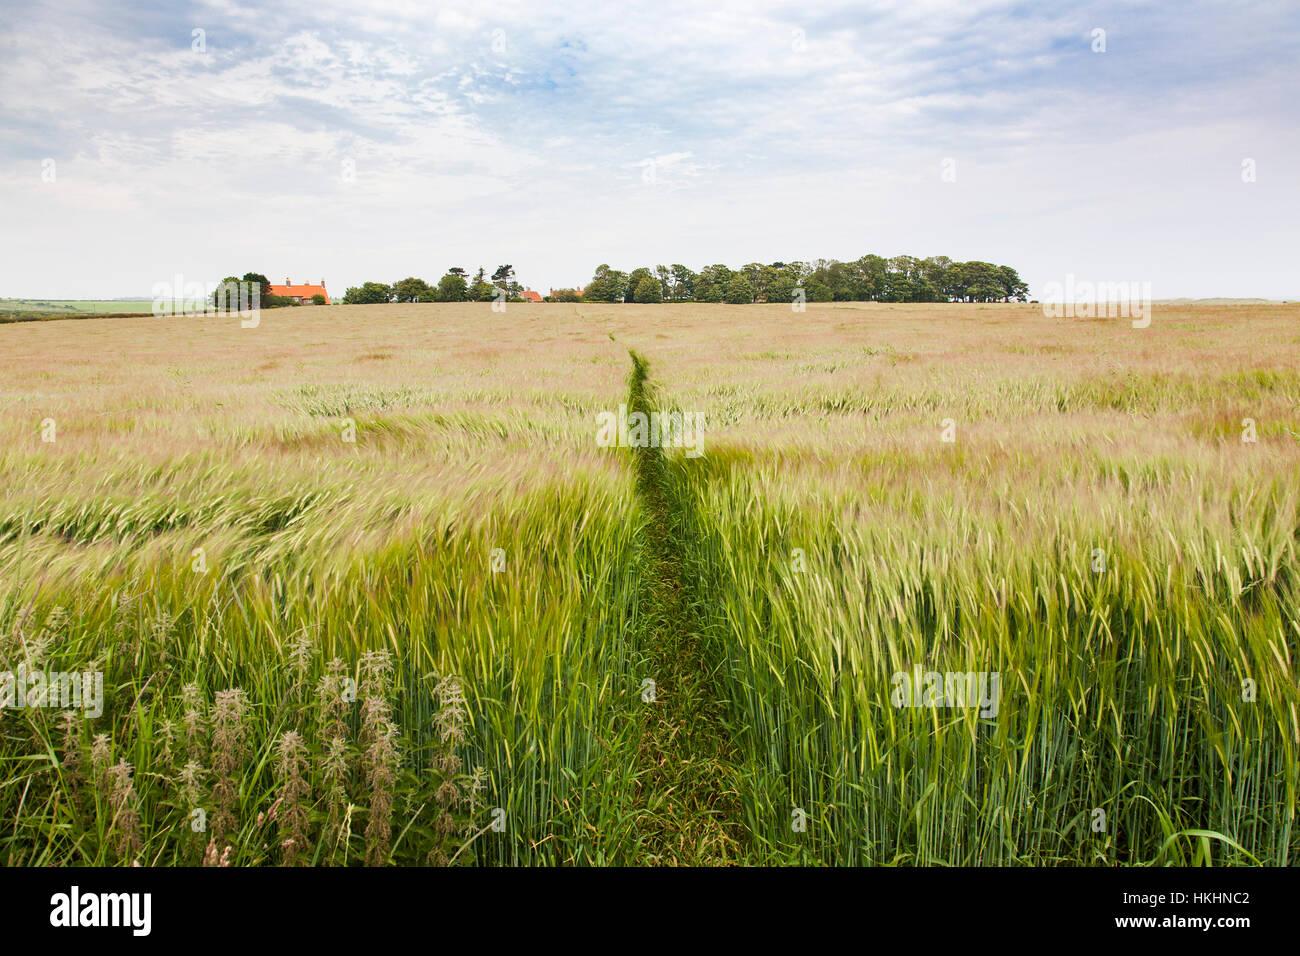 Field of barley - Stock Image